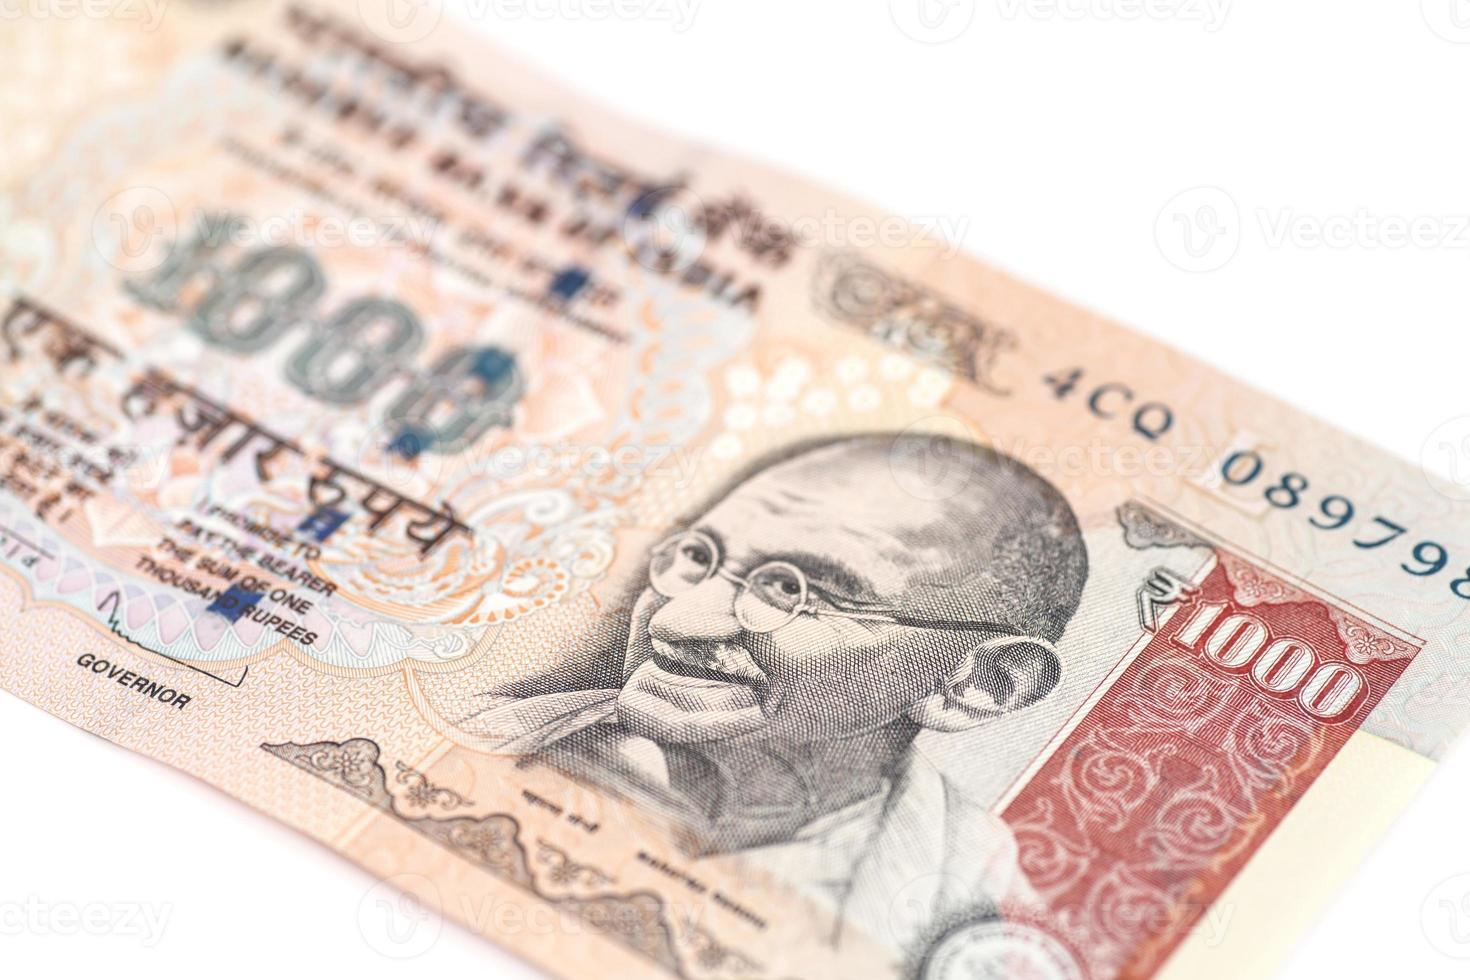 duizend roepiebiljet (Indiase valuta) foto